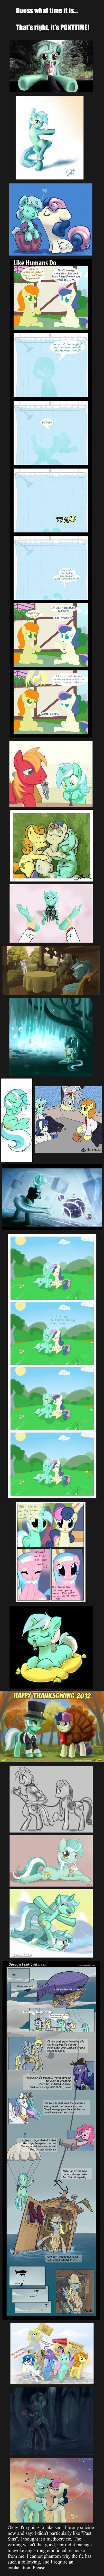 Ponycomp 221. Ponycomp 220: /channel/ponytime/Ponycomp+220/GRojGTE/ DOWNLOAD LINK: docs.google.com/folder/d/0B4SOCzXHPRD.... My Little Pony ponies ponytime